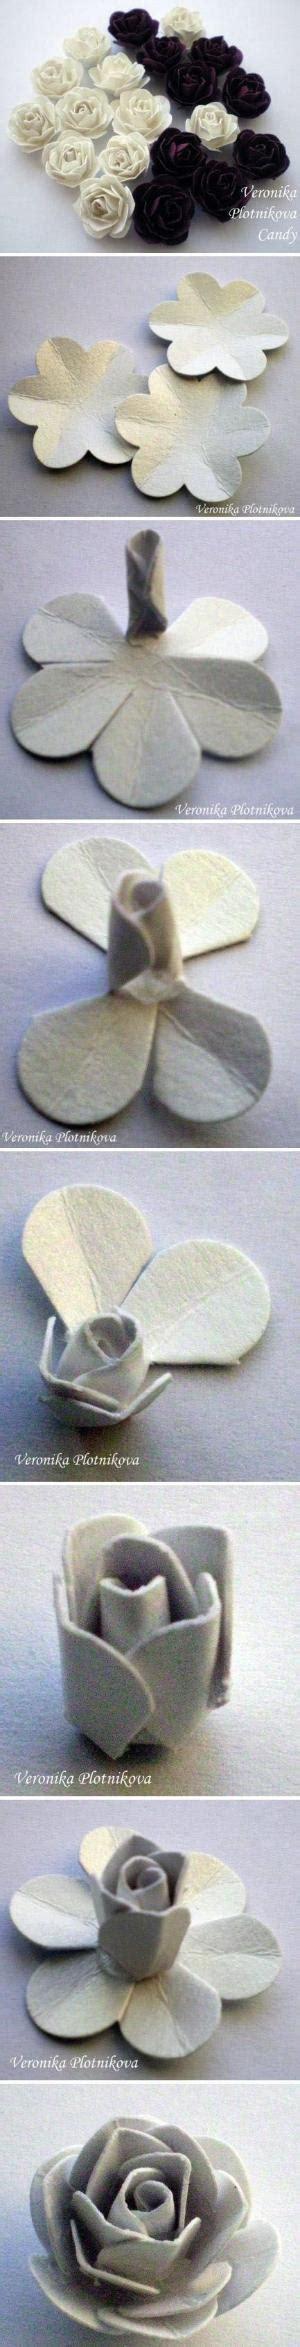 Beautiful Paper Crafts - beautiful paper flower diy crafts tutorials